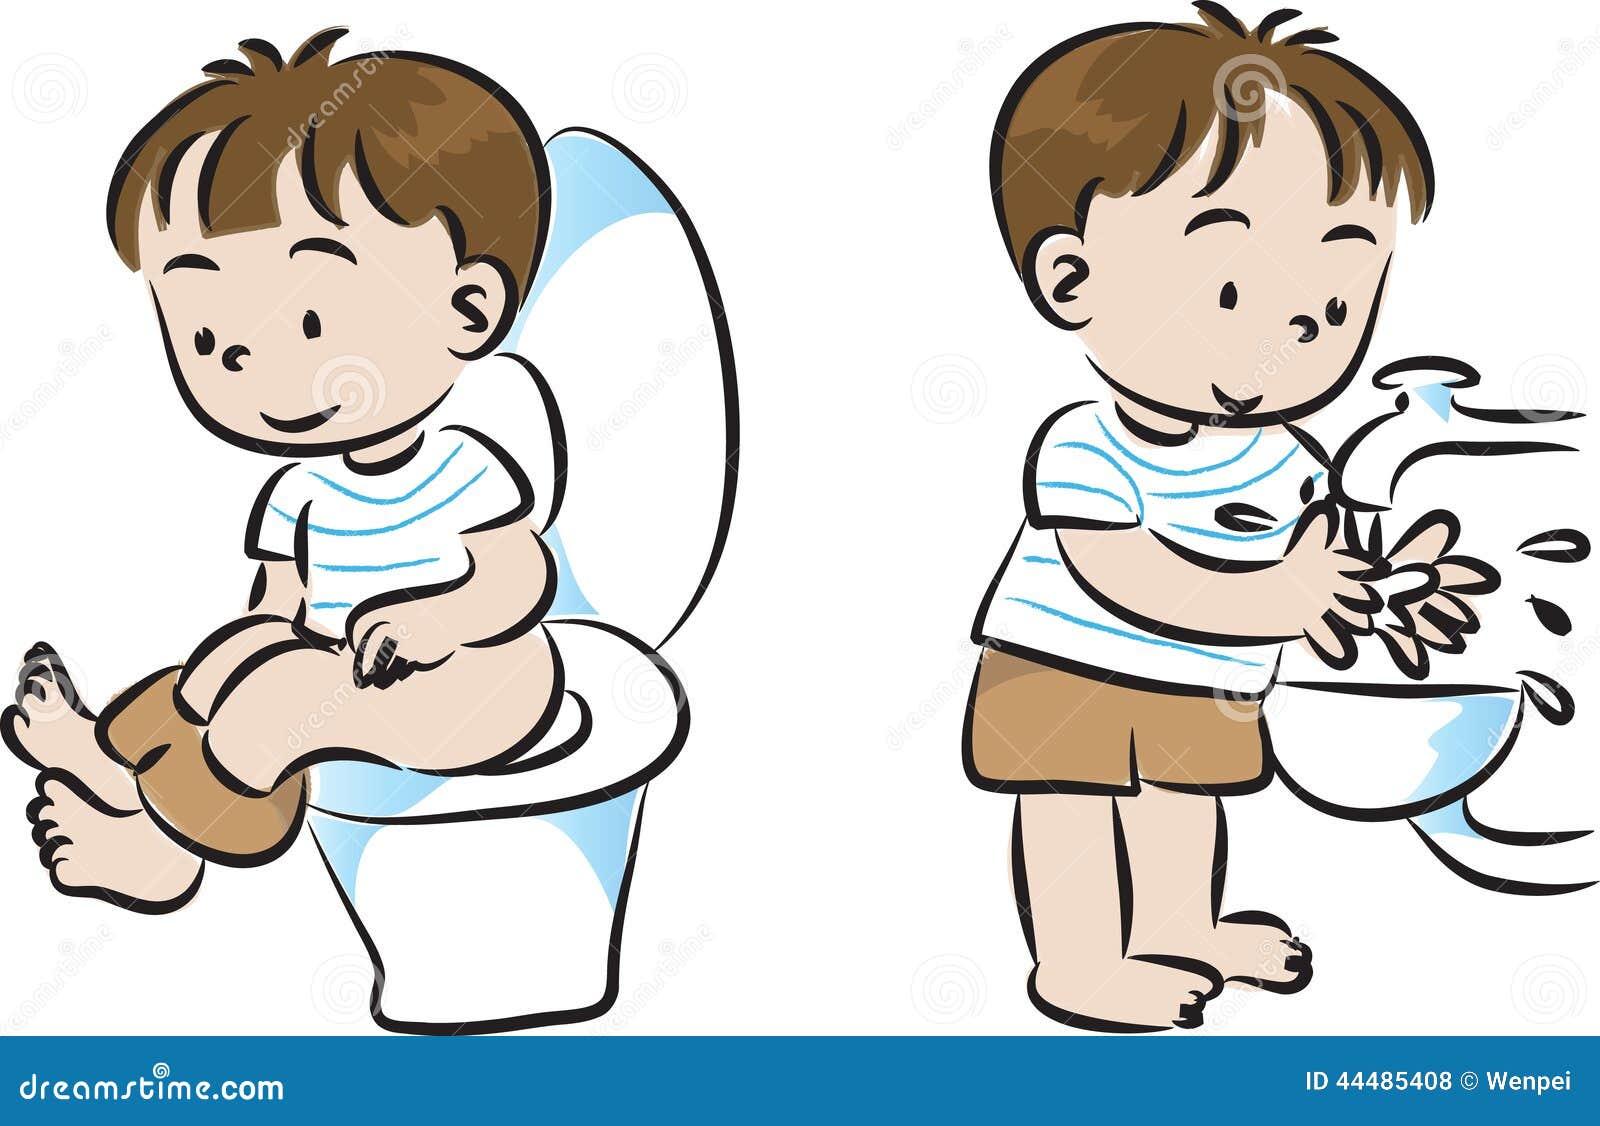 Toilet Seat Hygiene